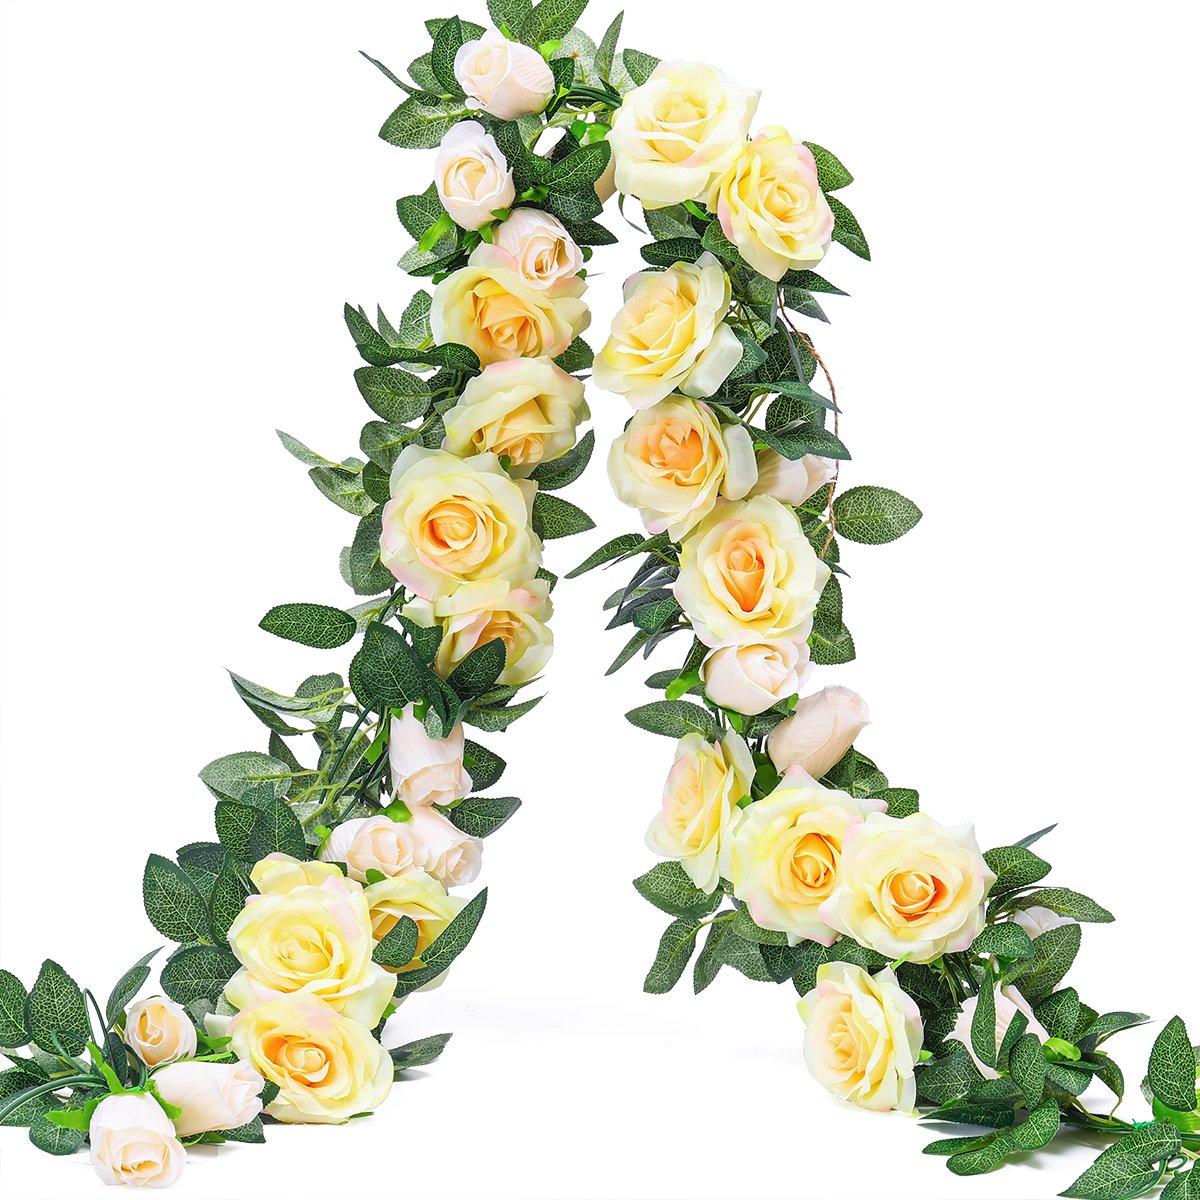 PARTY JOY 6.5Ft Artificial Rose Vine Silk Flower Garland Hanging Baskets Plants Home Outdoor Wedding Arch Garden Wall Decor,2PCS (Champagne)